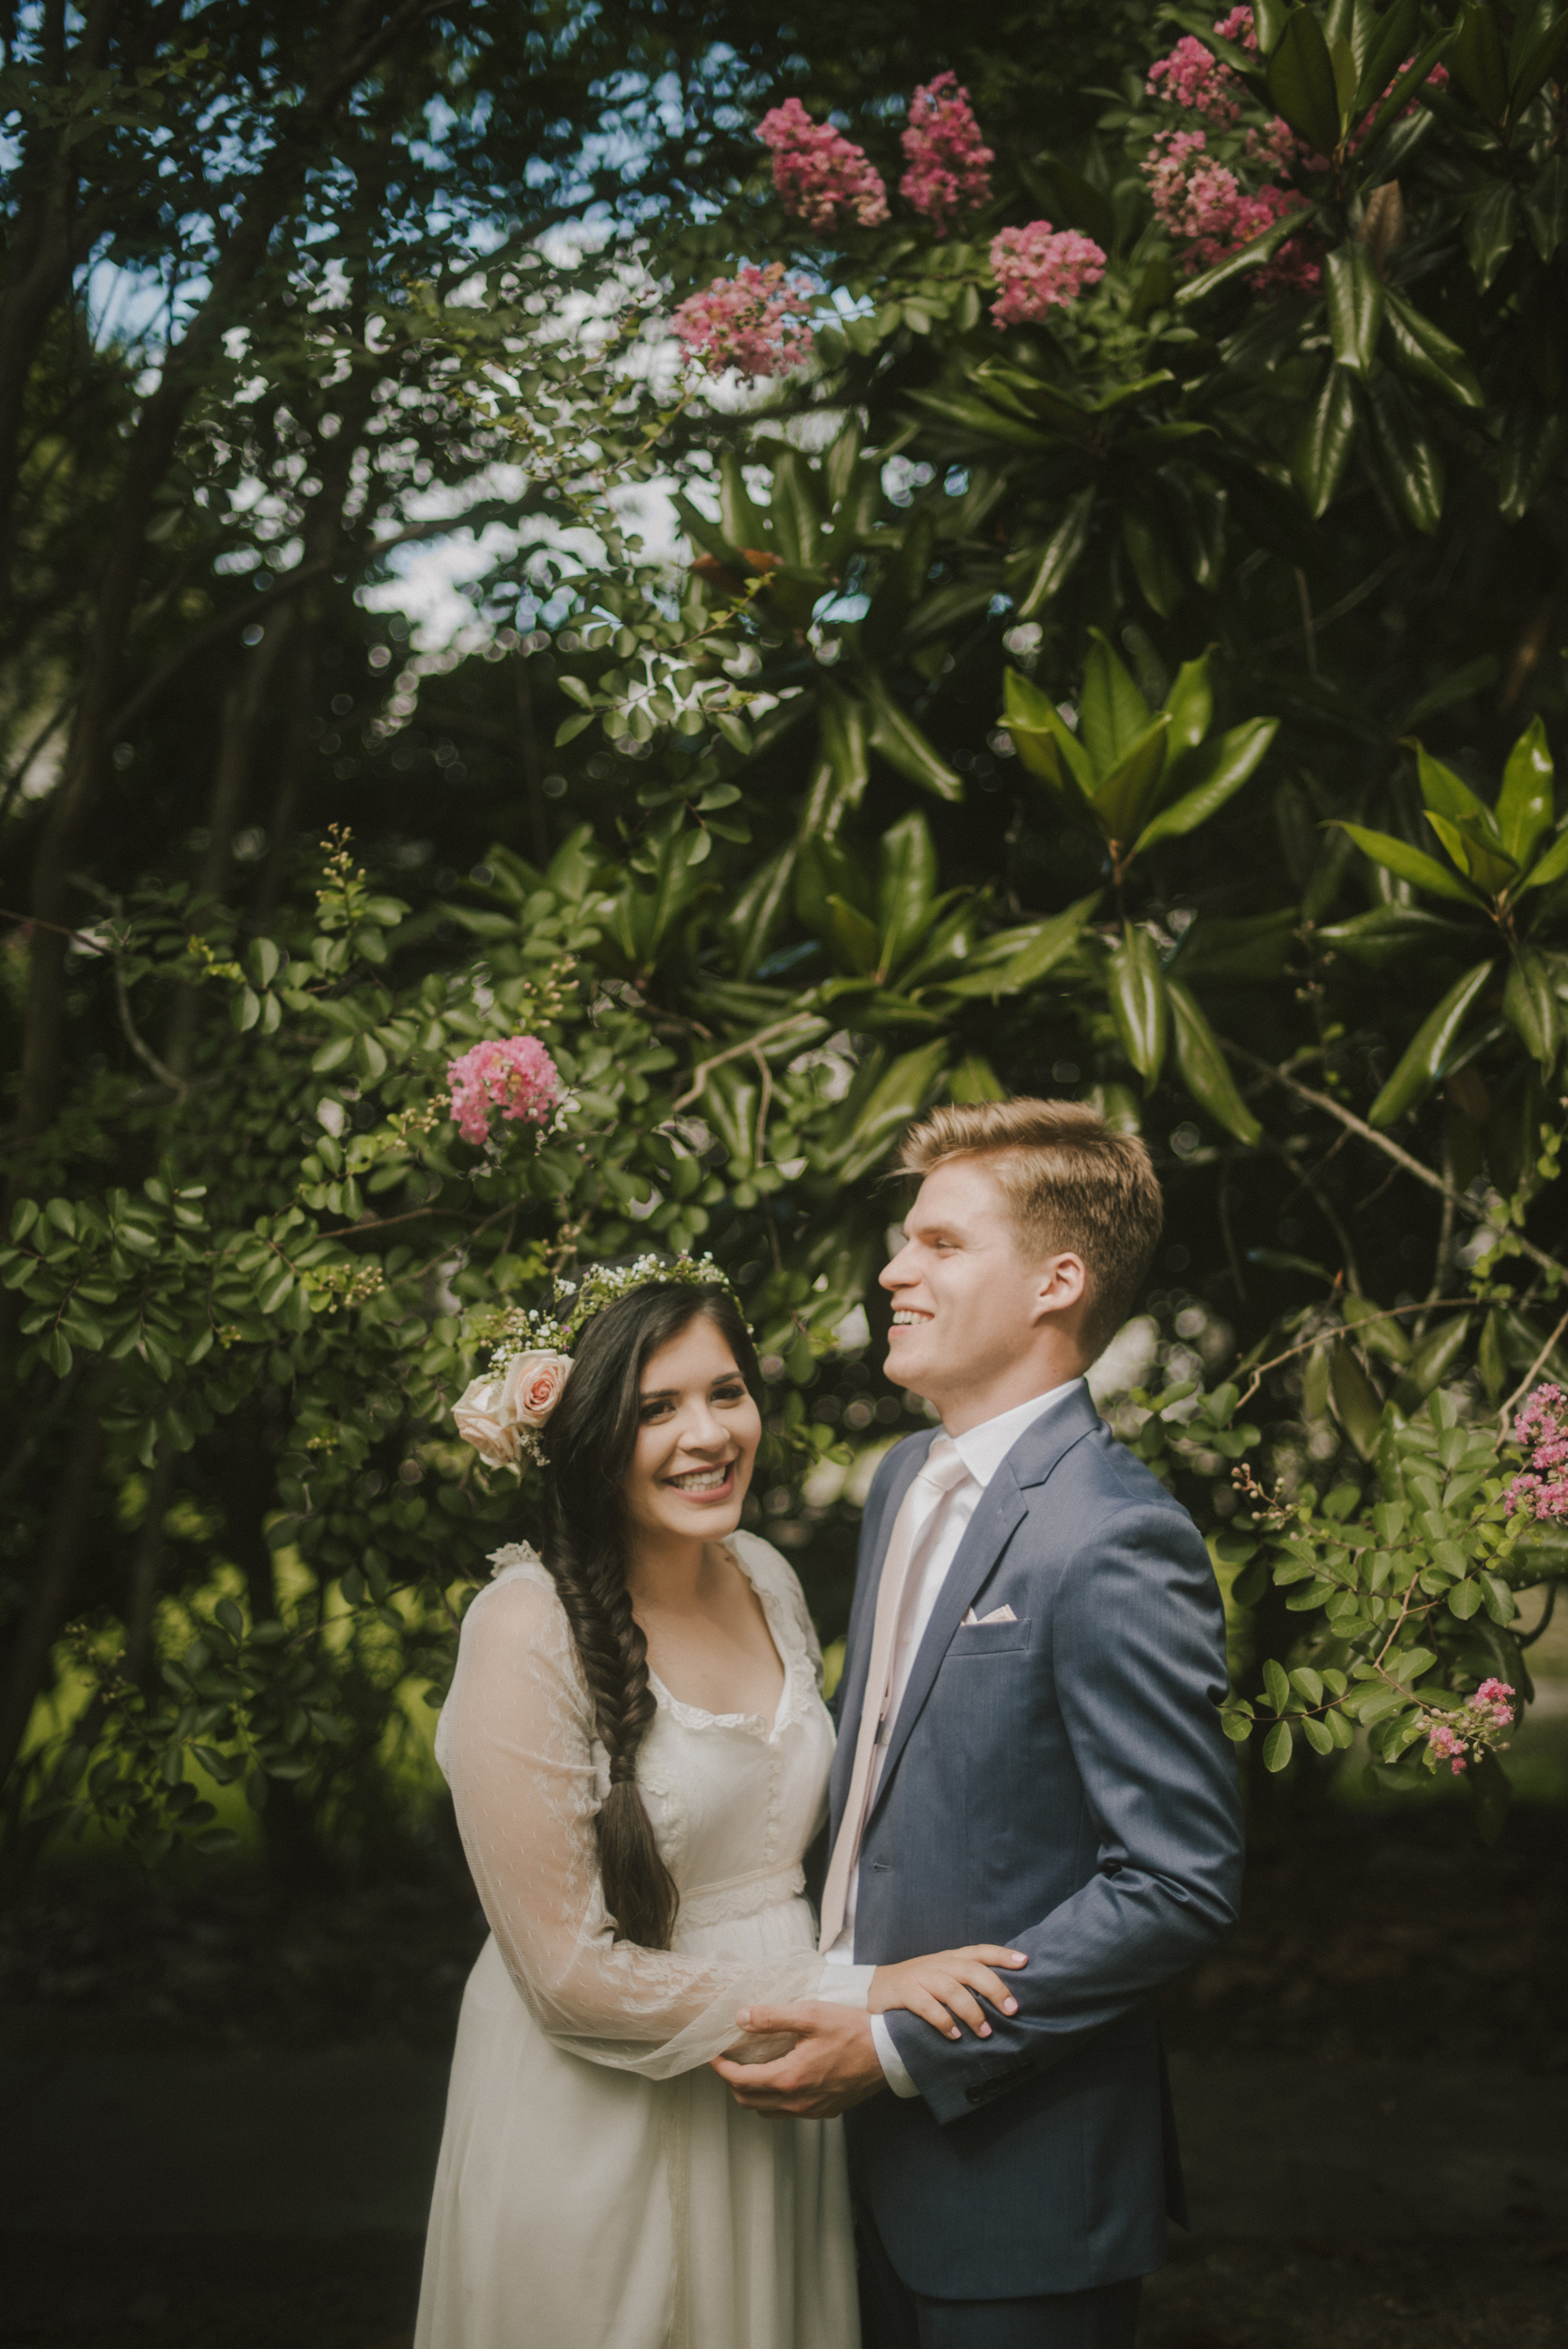 ofRen_weddingphotographer-79.jpg